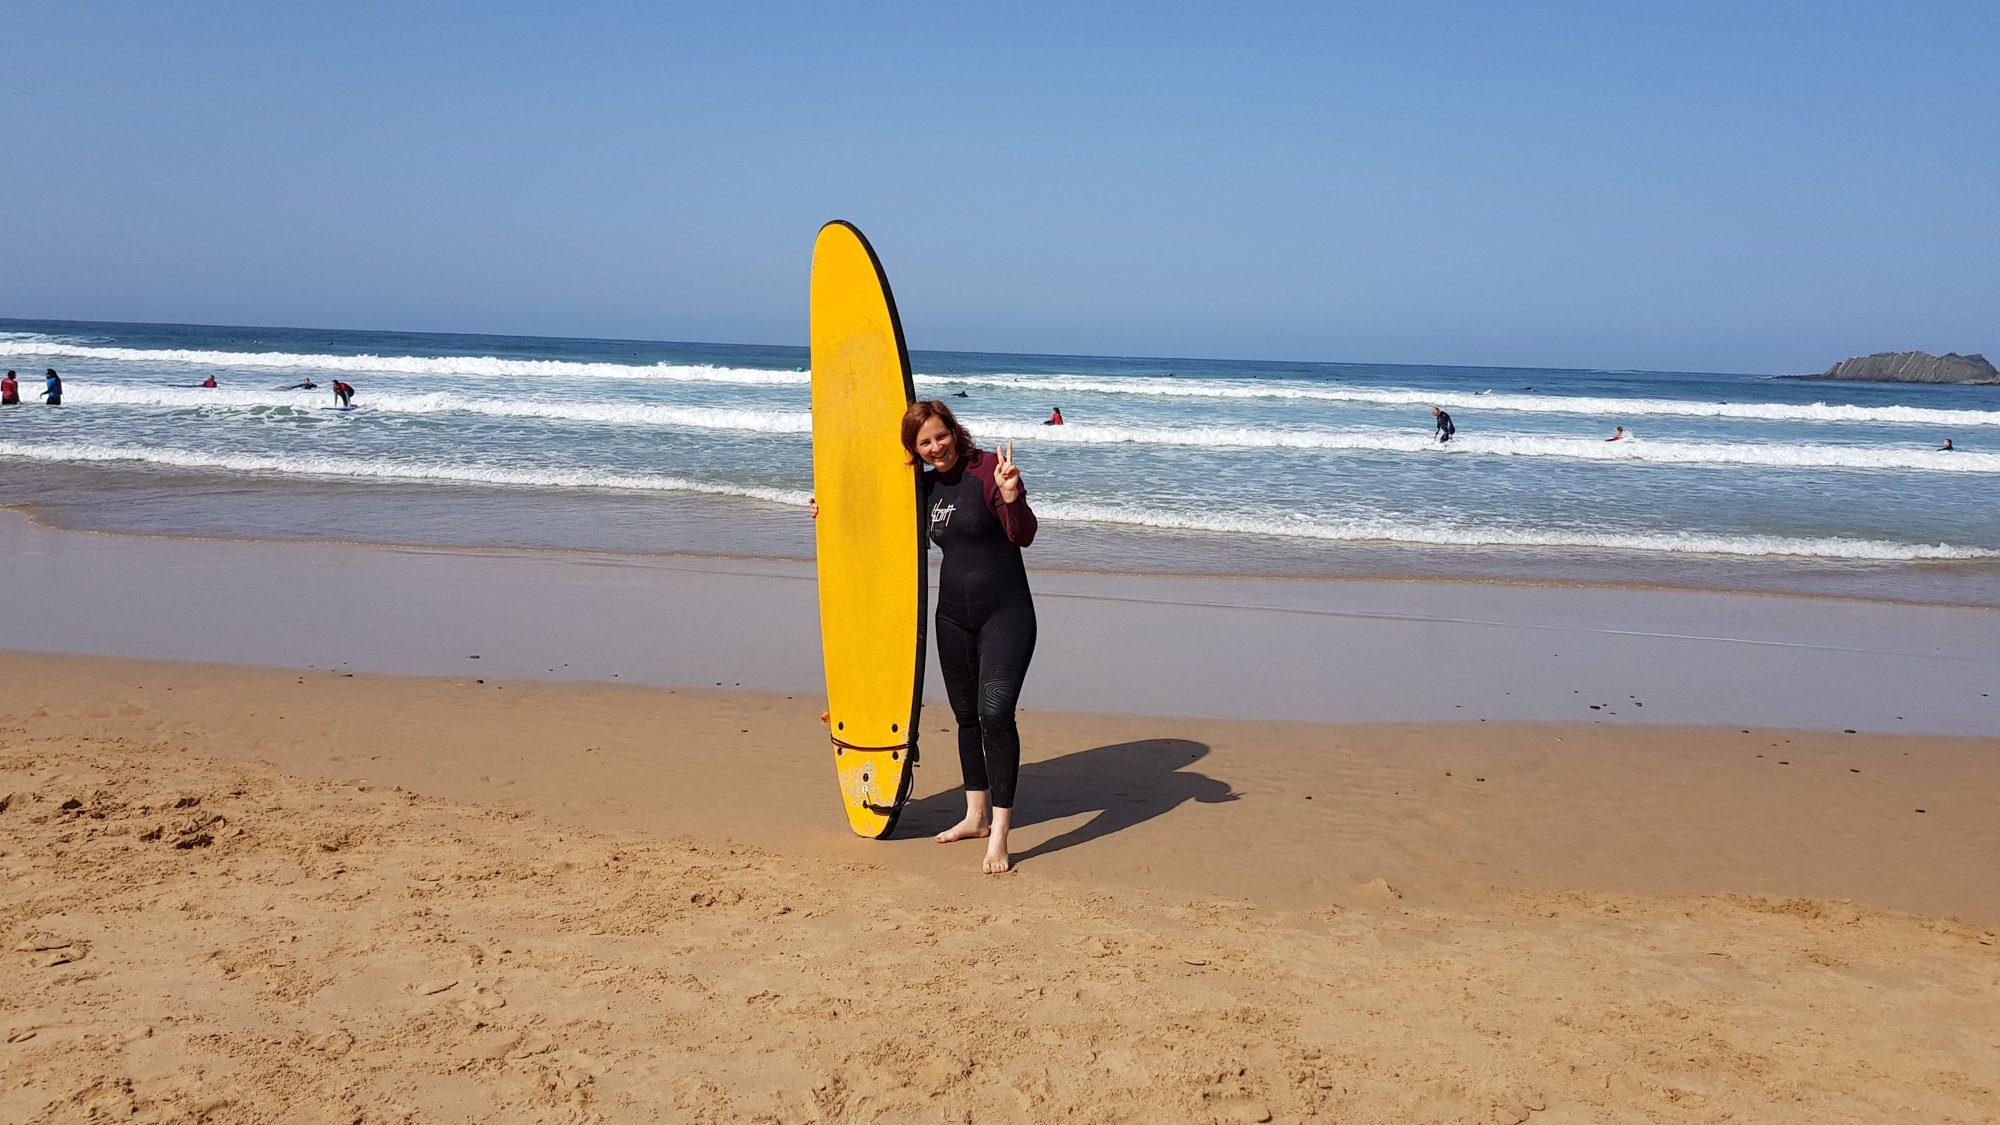 Surfing girl in Arifana